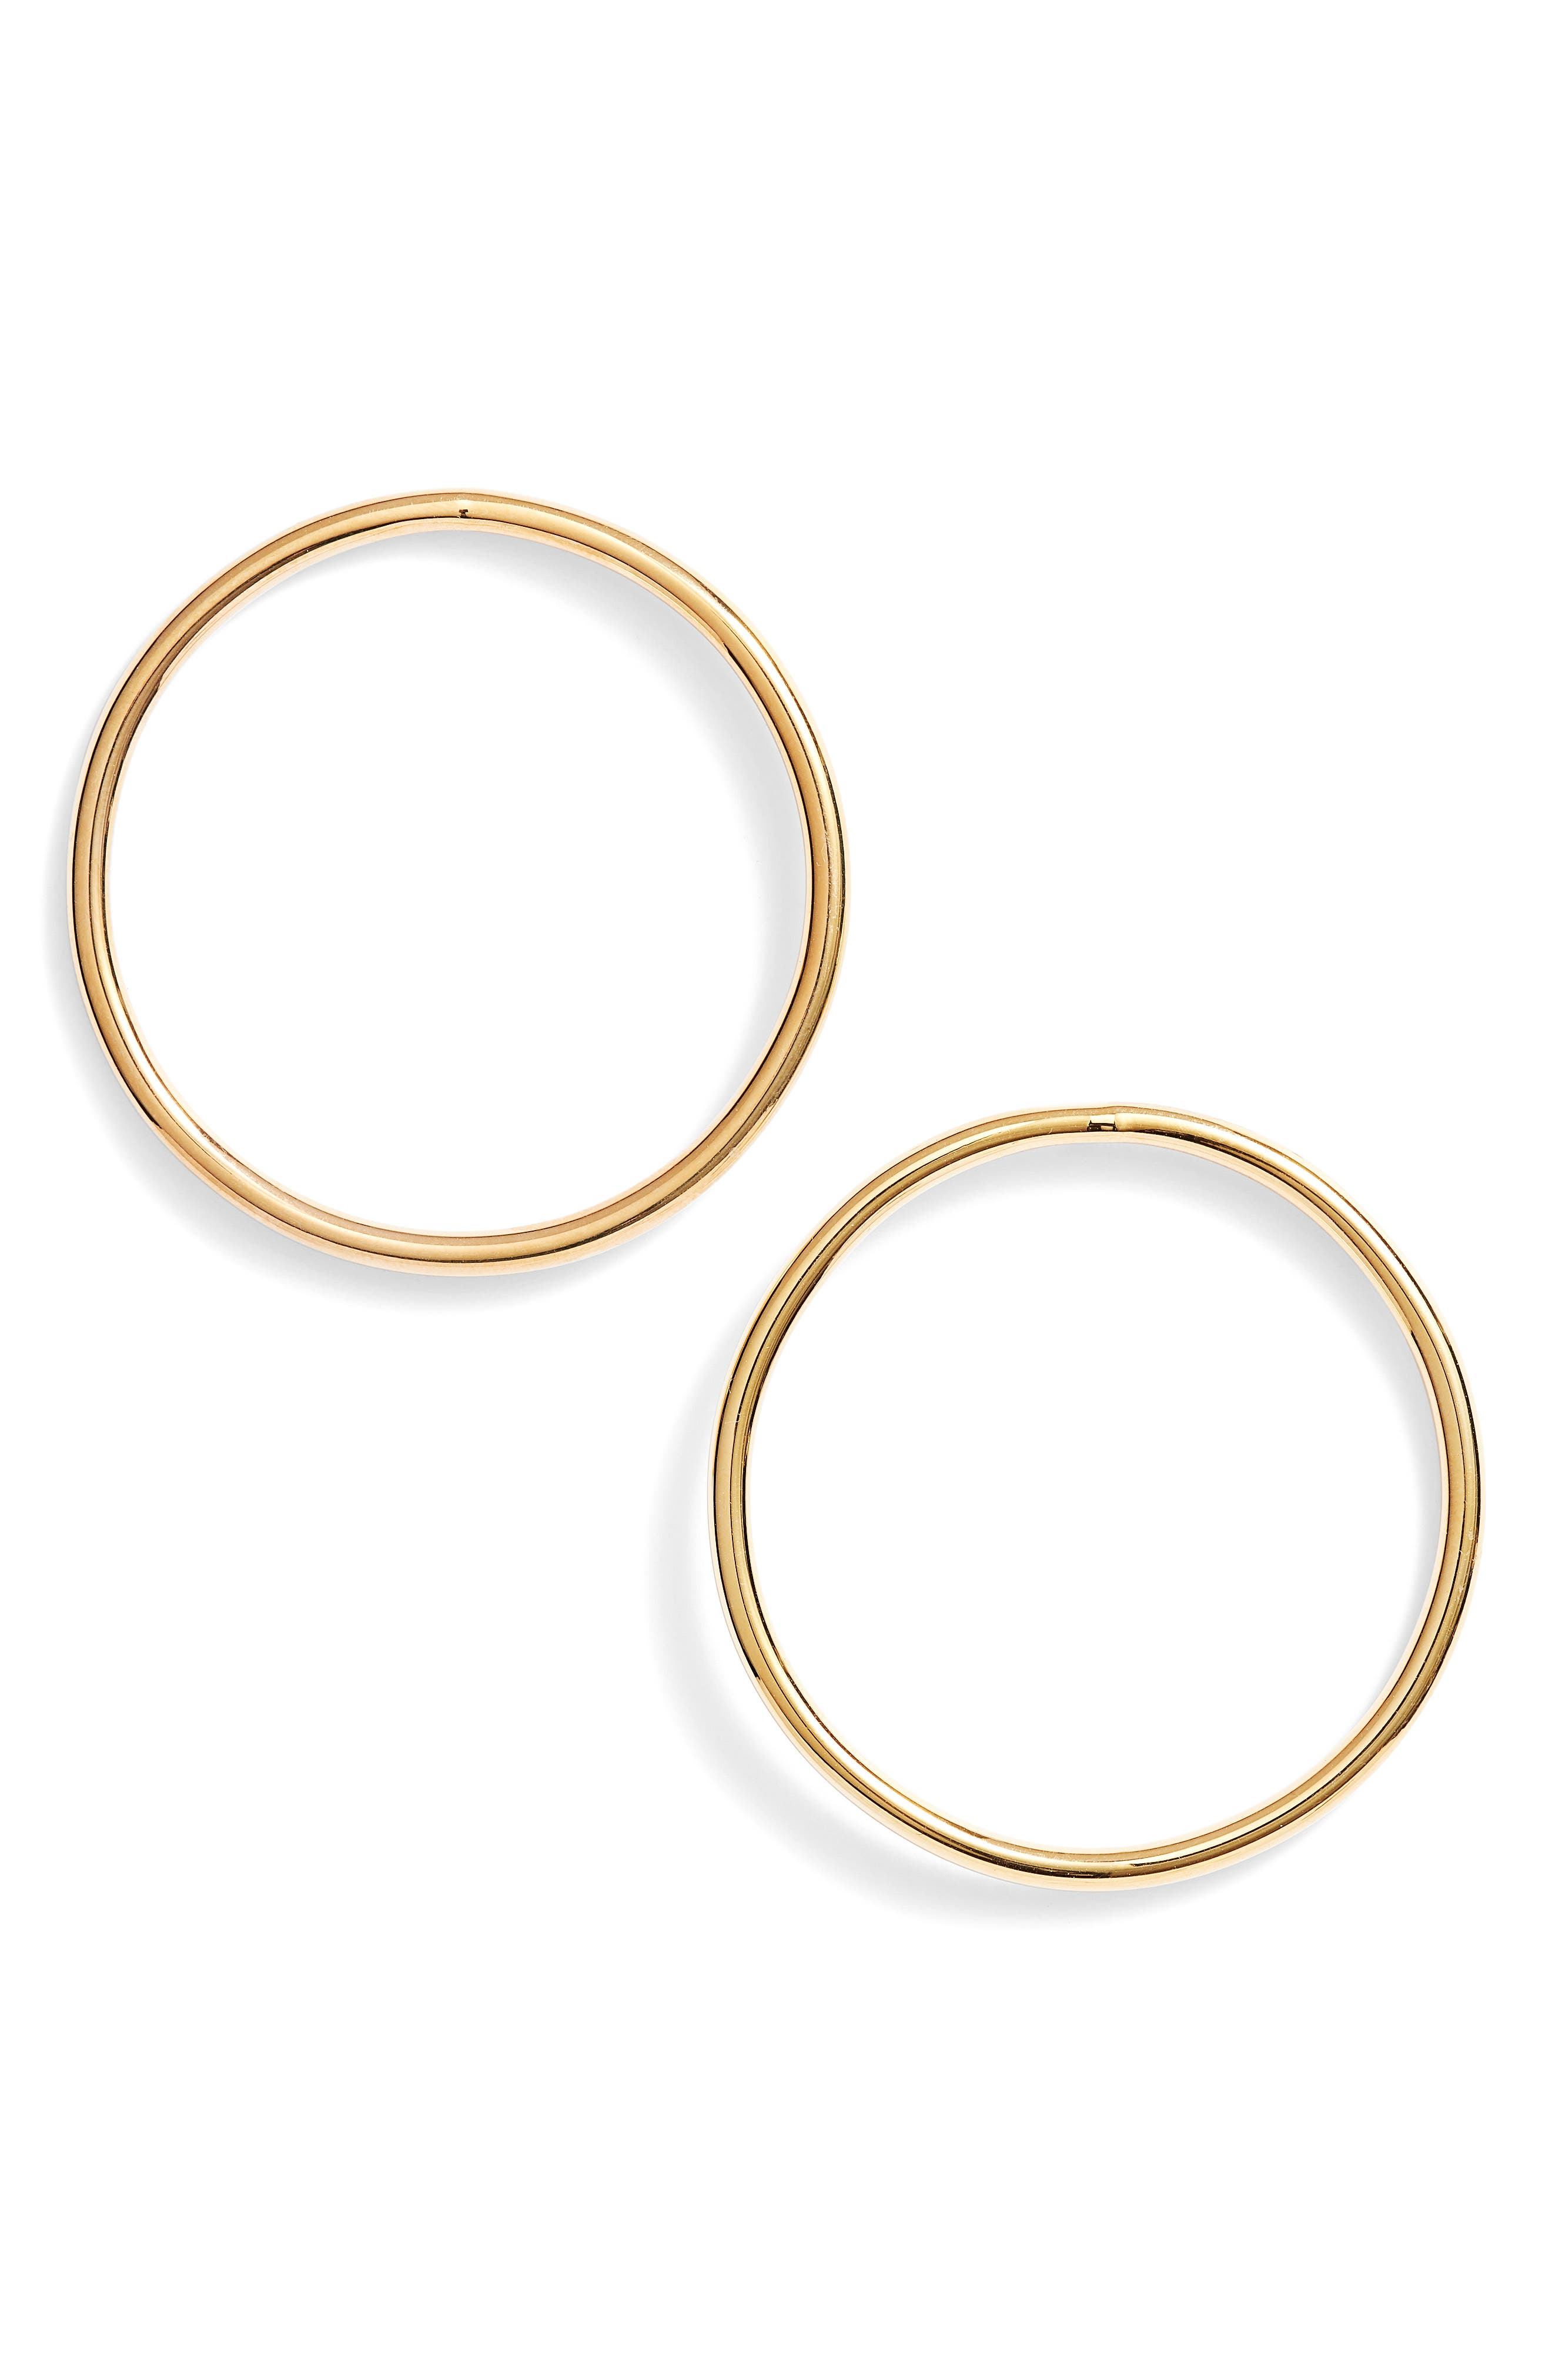 Valentino Valentino Woman Gold-tone Hoop Earrings Gold Size FtHQxsbzu